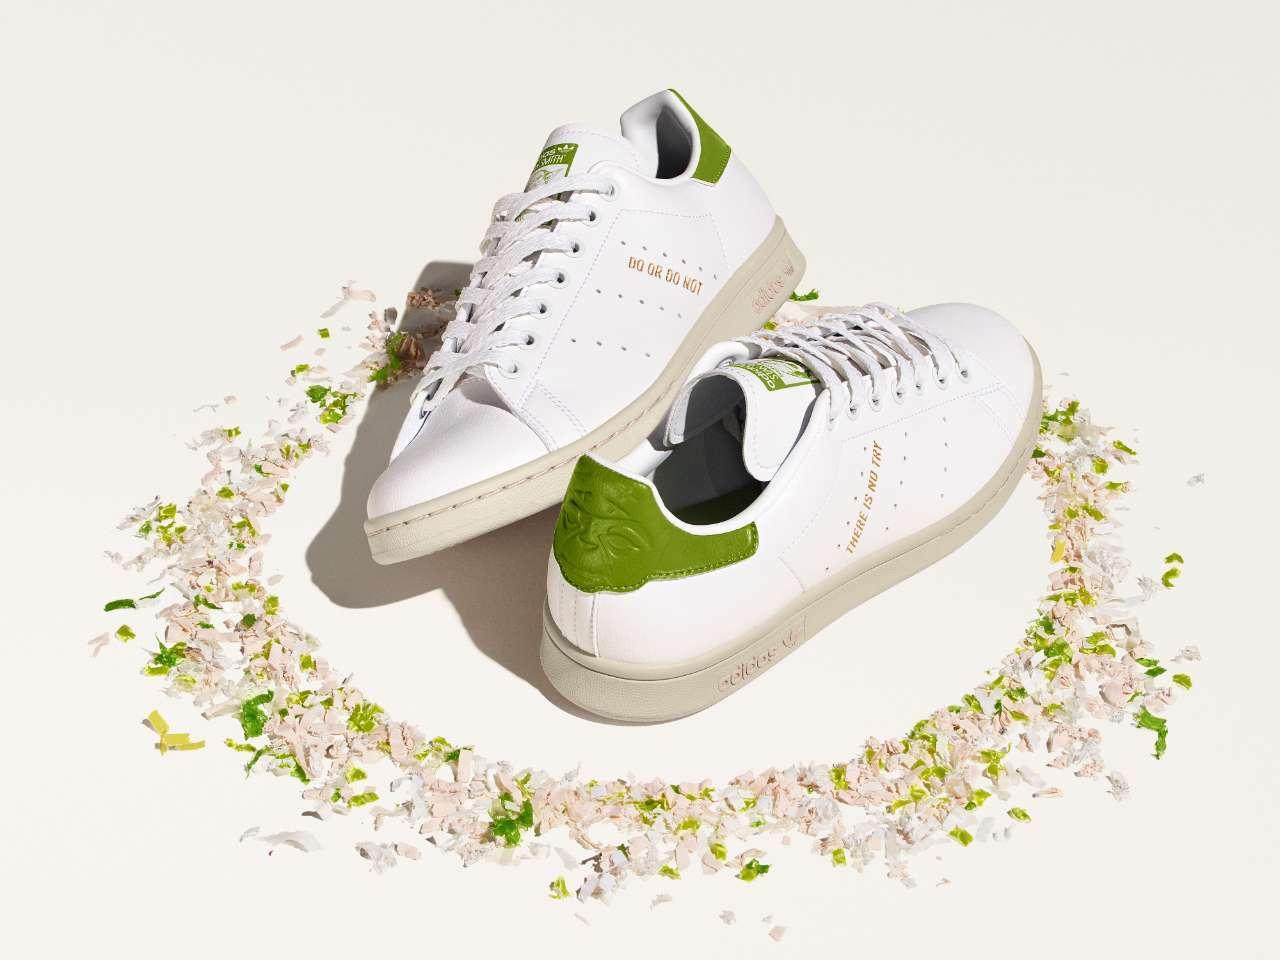 stan-smith-star-wars-yoda-sneakers